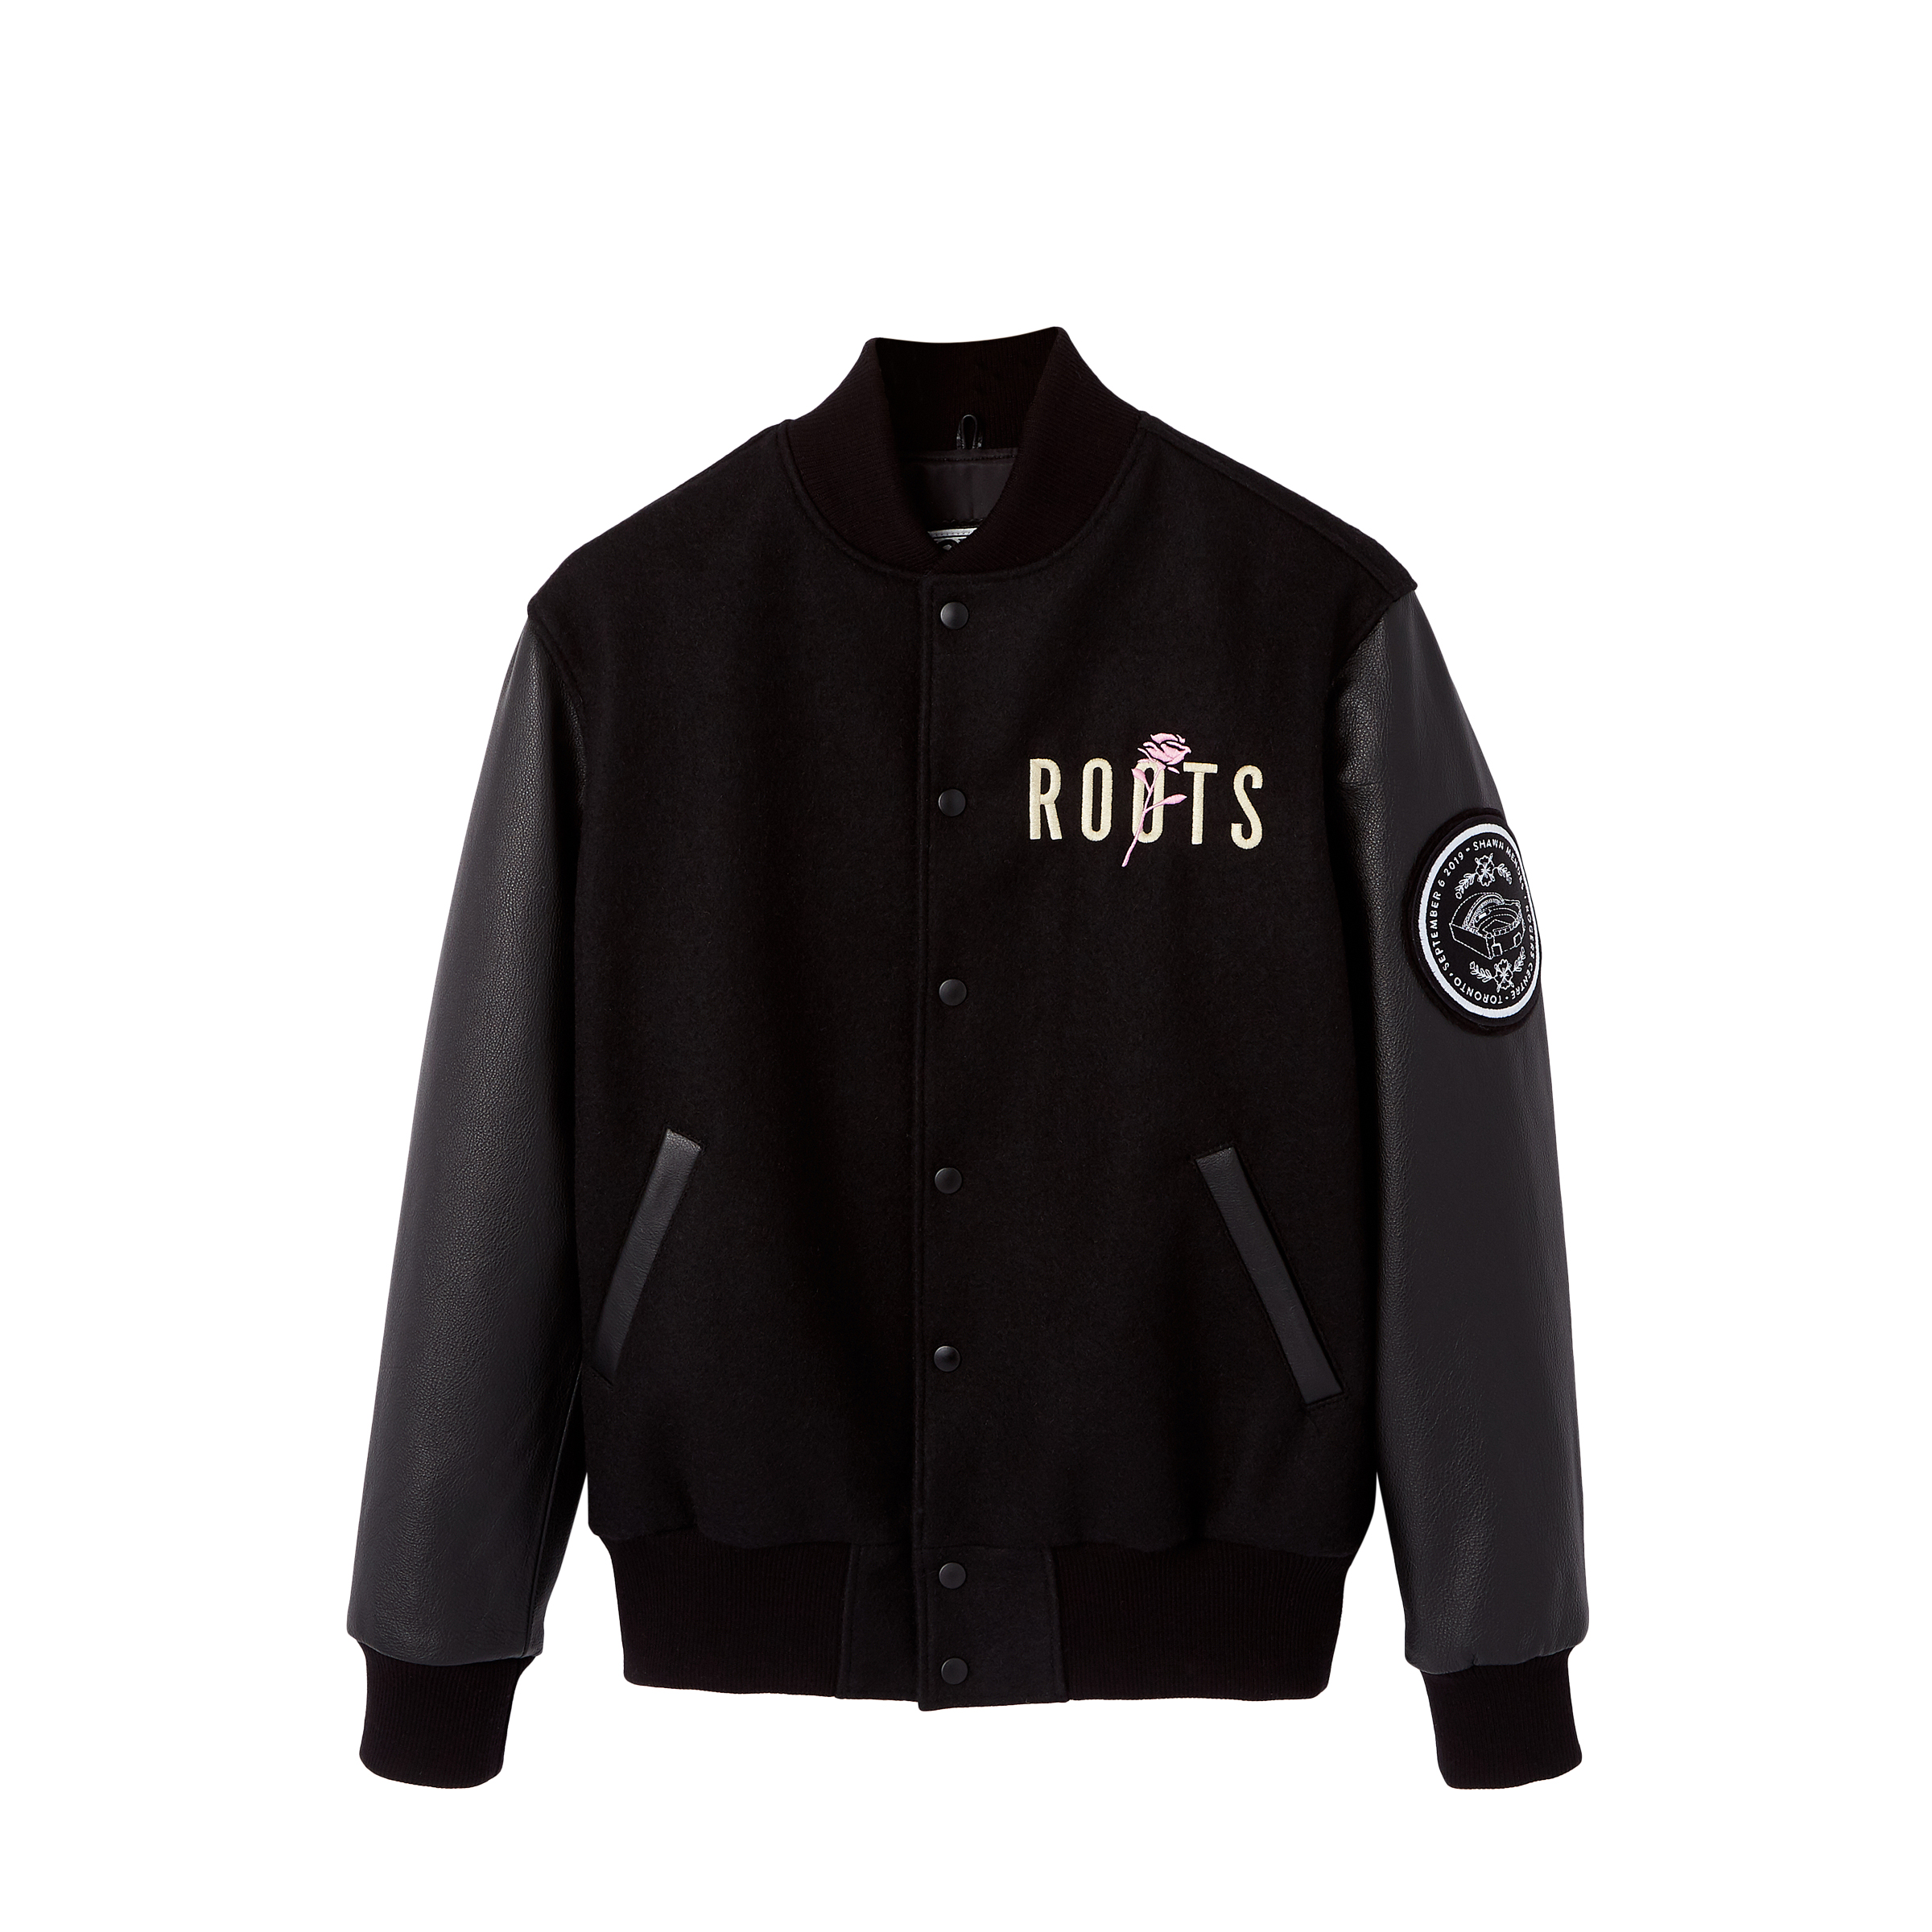 Roots x Shawn Mendes Award Jacket 1.jpg